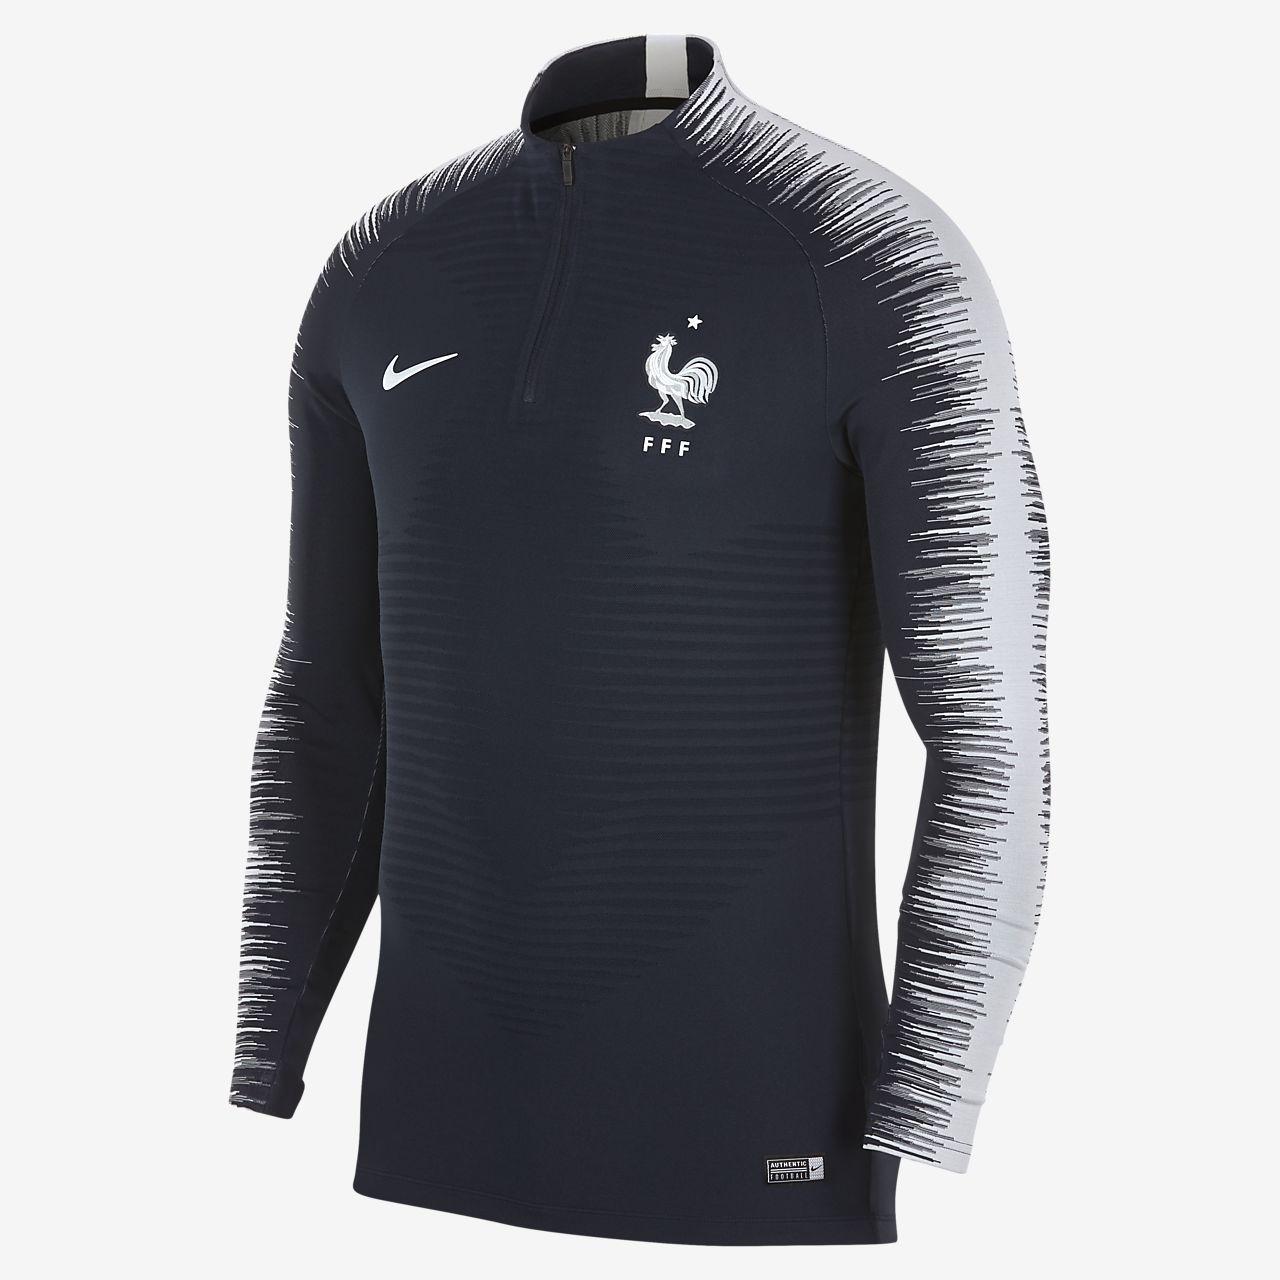 37c1f3c69 FFF VaporKnit Strike Drill Men s Long-Sleeve Football Top. Nike.com IE